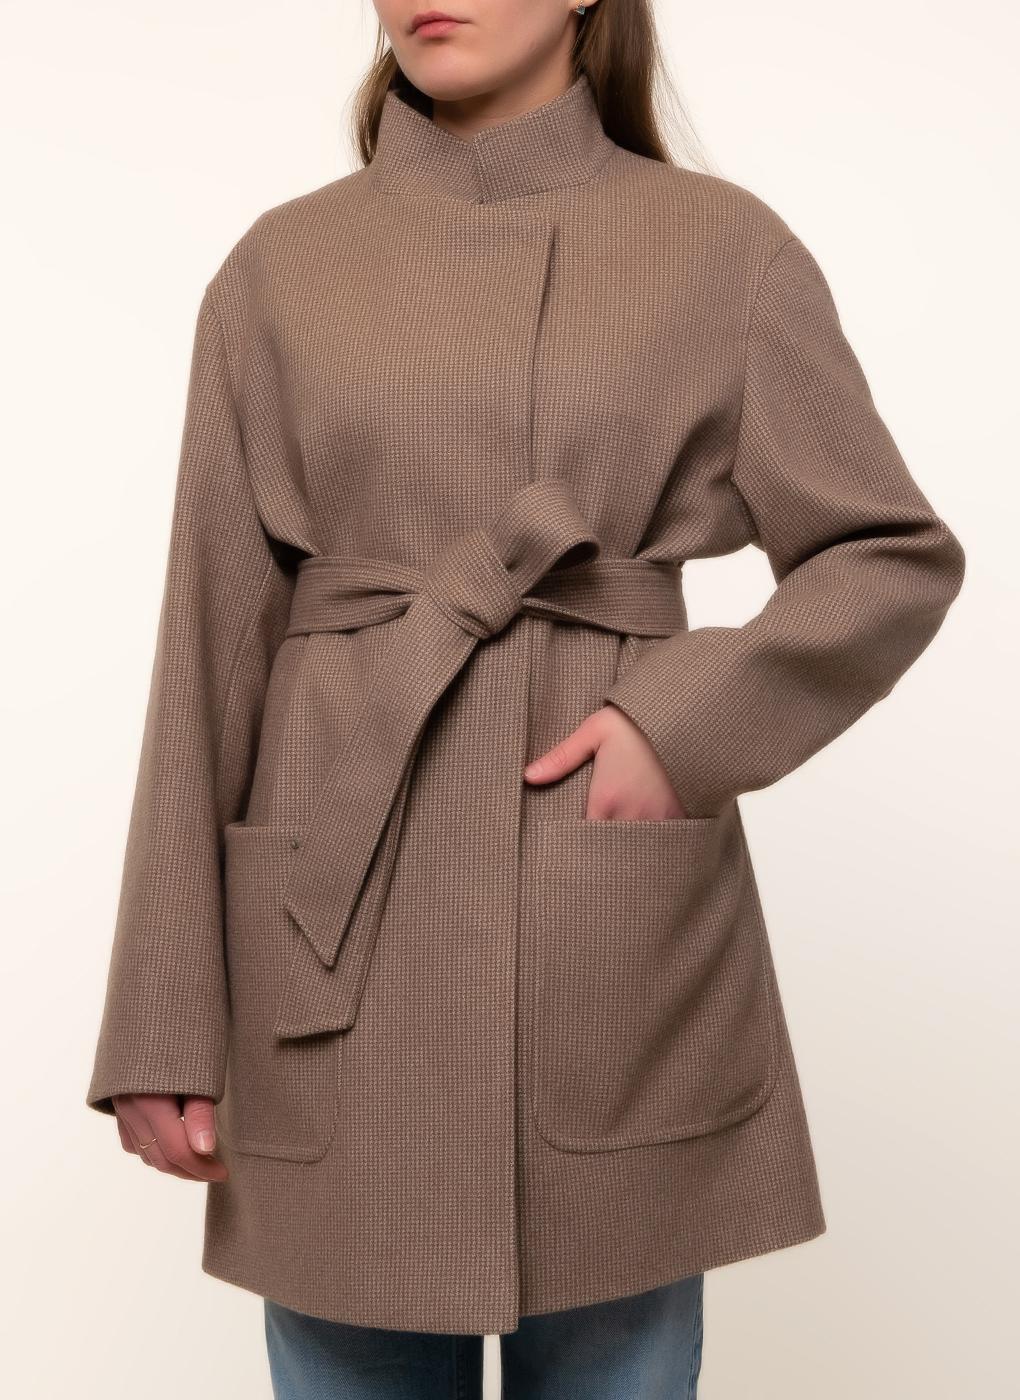 Пальто полушерстяное 104, idekka фото